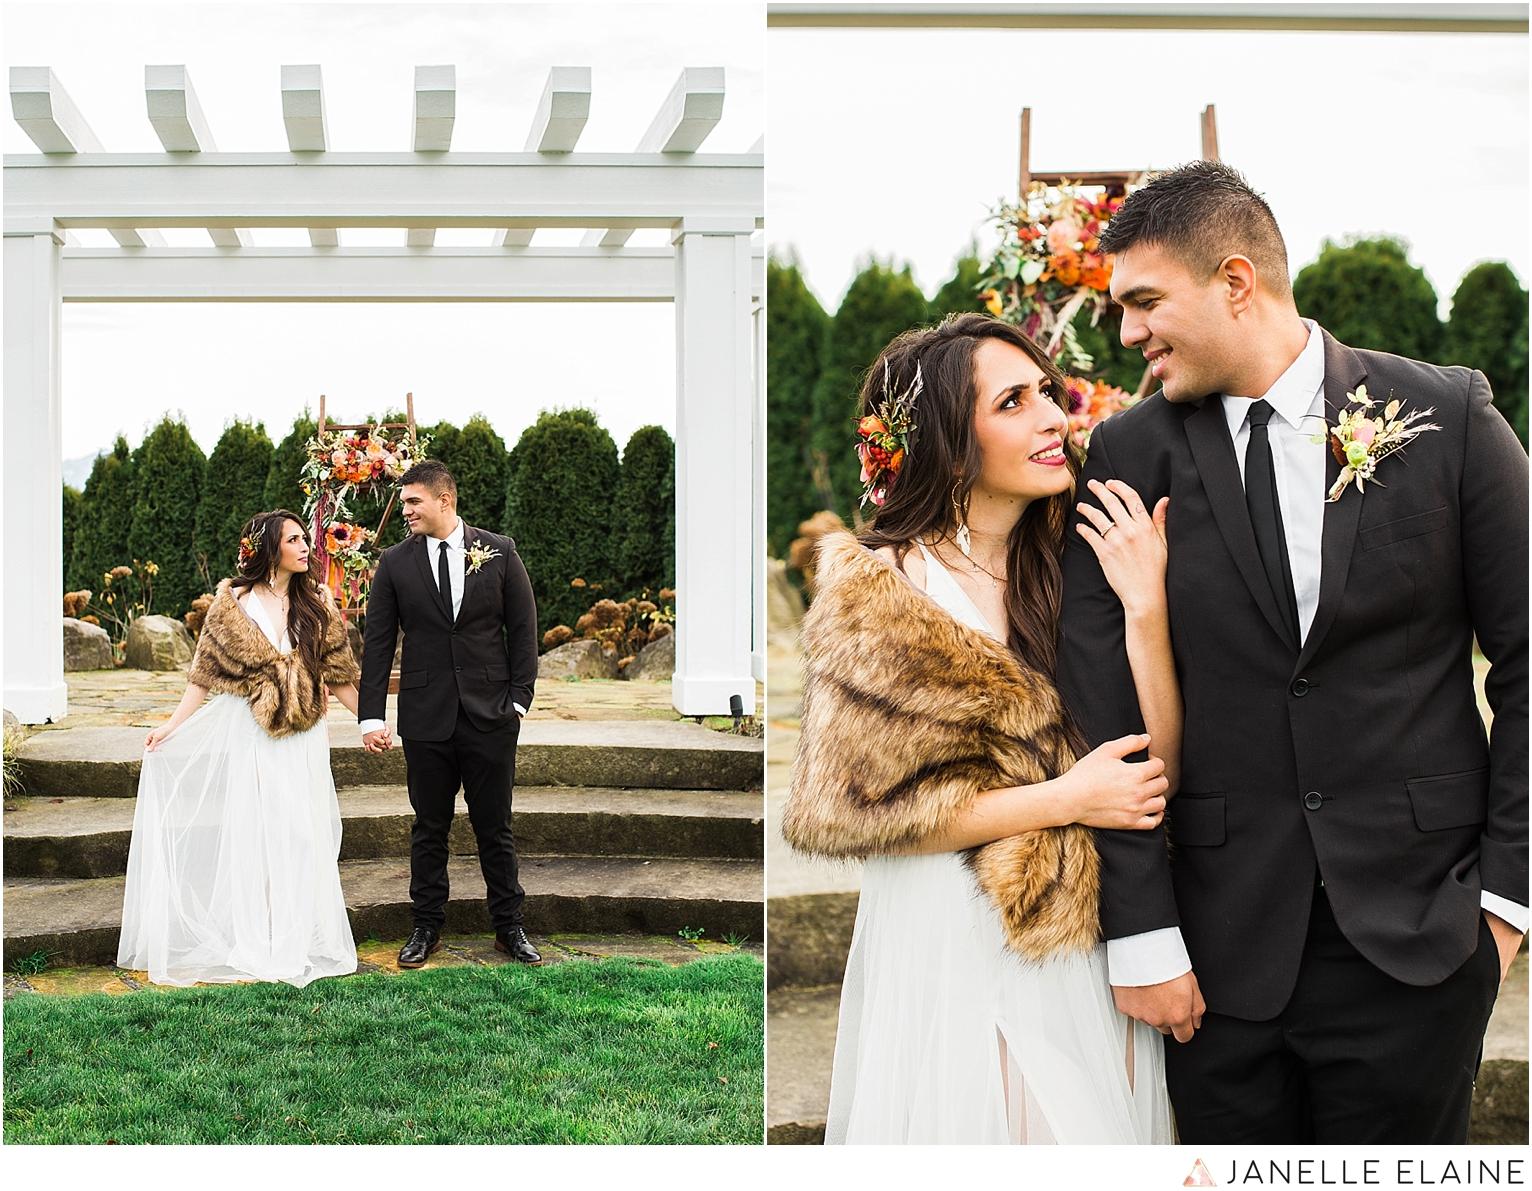 elopement-wedding-photographer-seattle washington-photographers-91.jpg